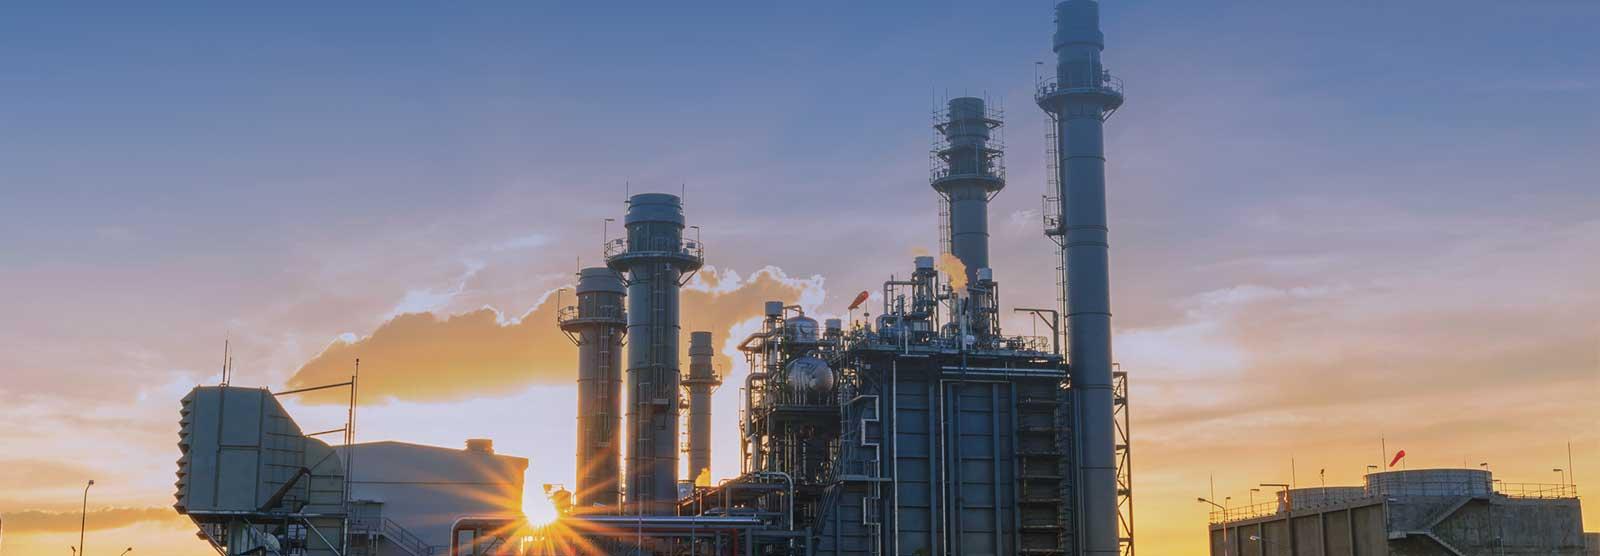 energy-industry-law-howell-willingham